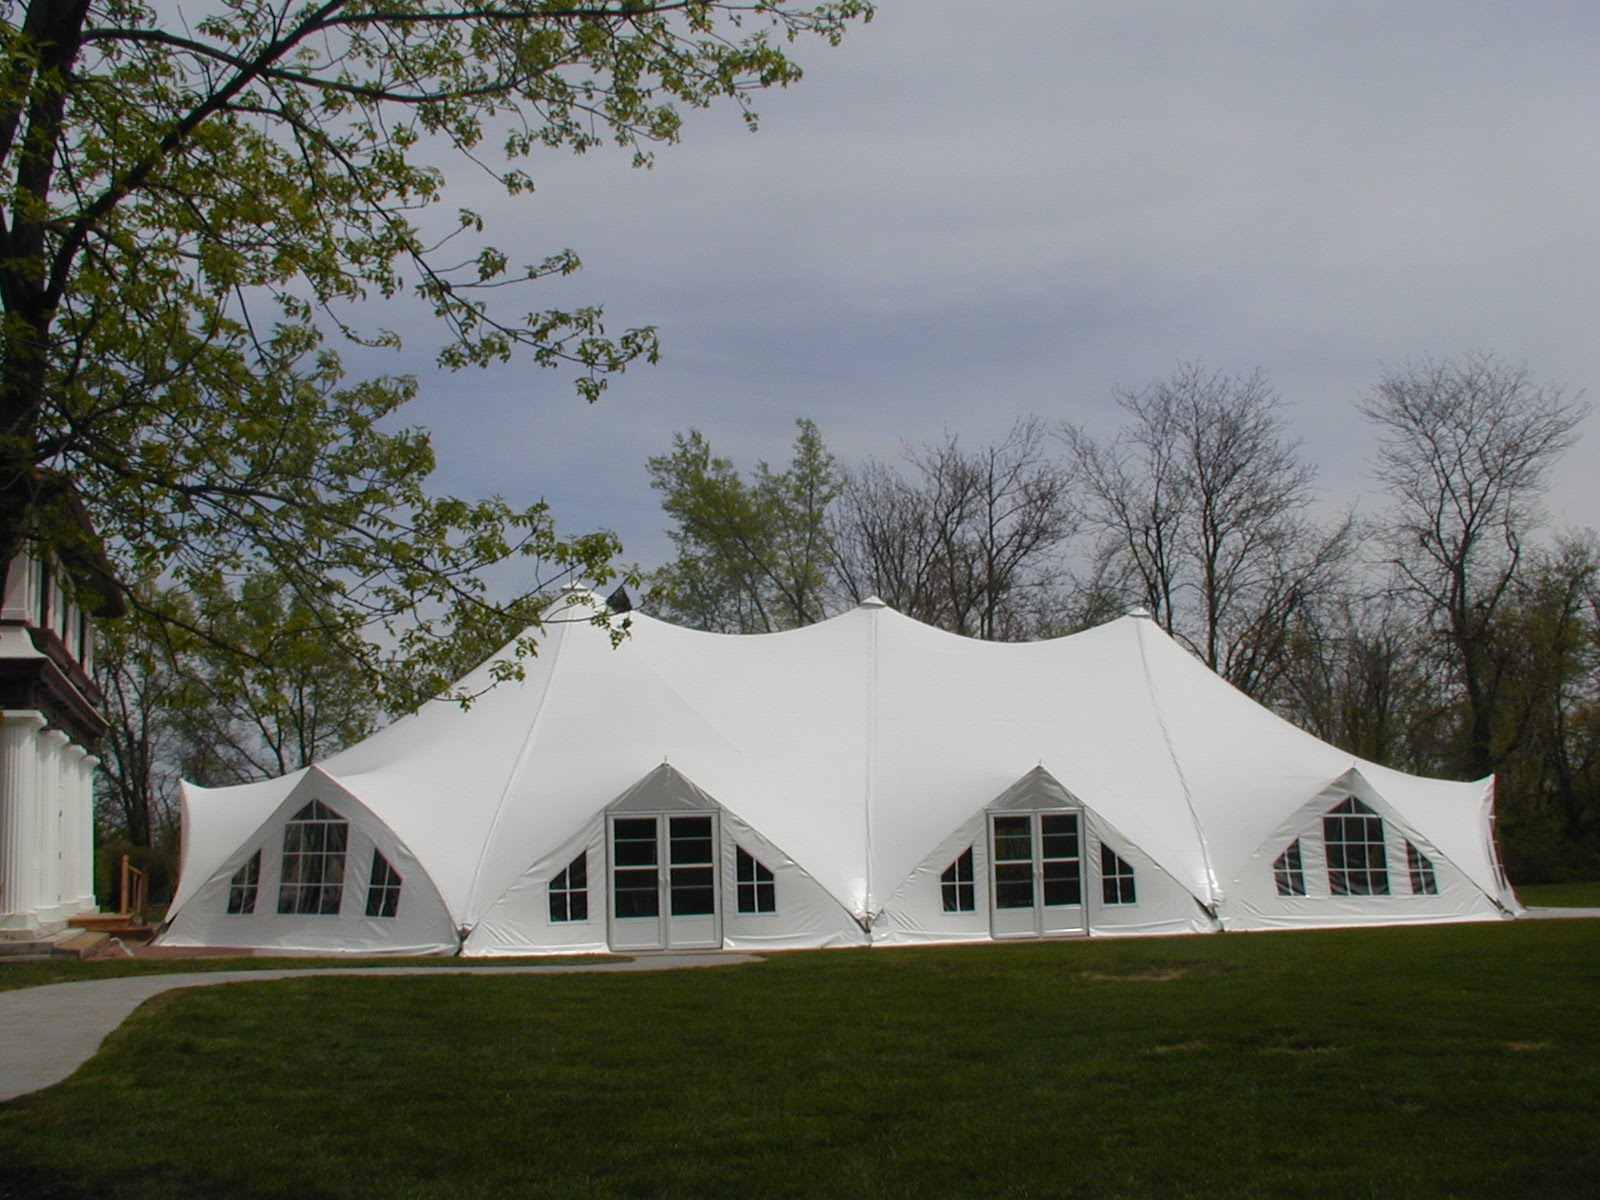 Wedding Themes - Wedding Style: Types of Wedding Tents